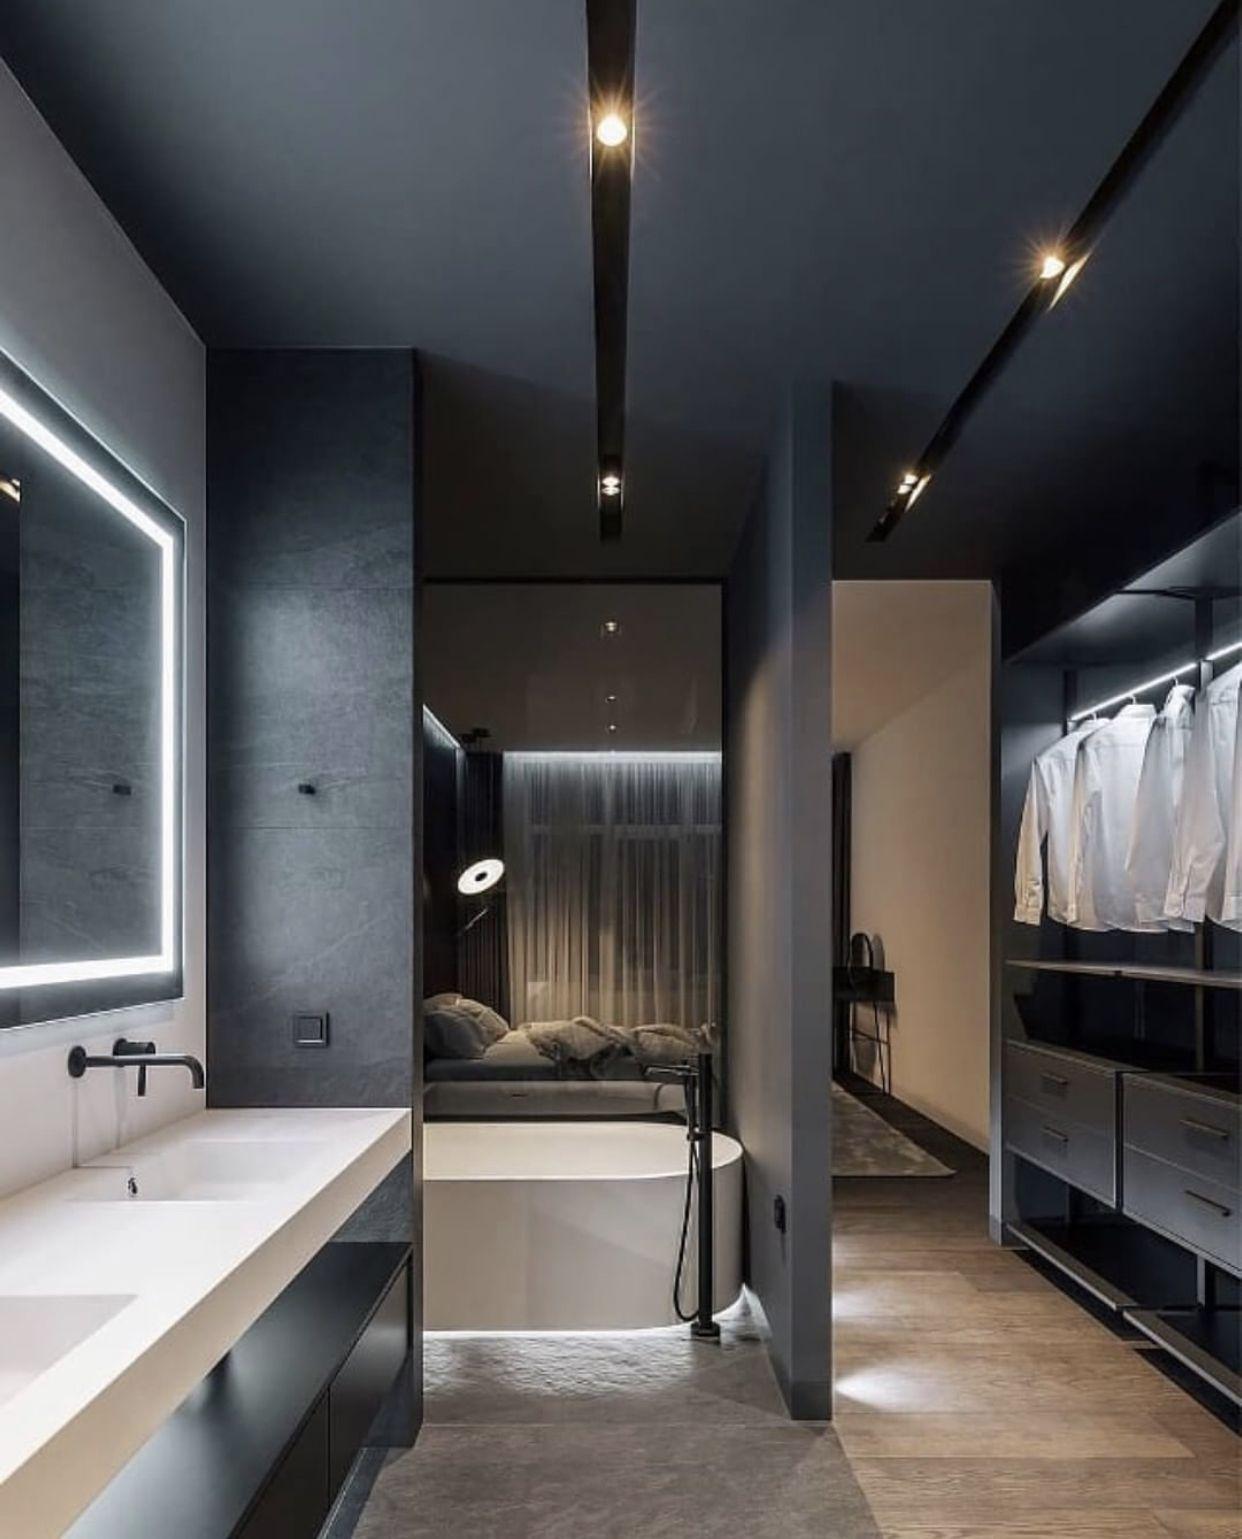 Pin by Javier Bonilla on mood board  Hotel bathroom design